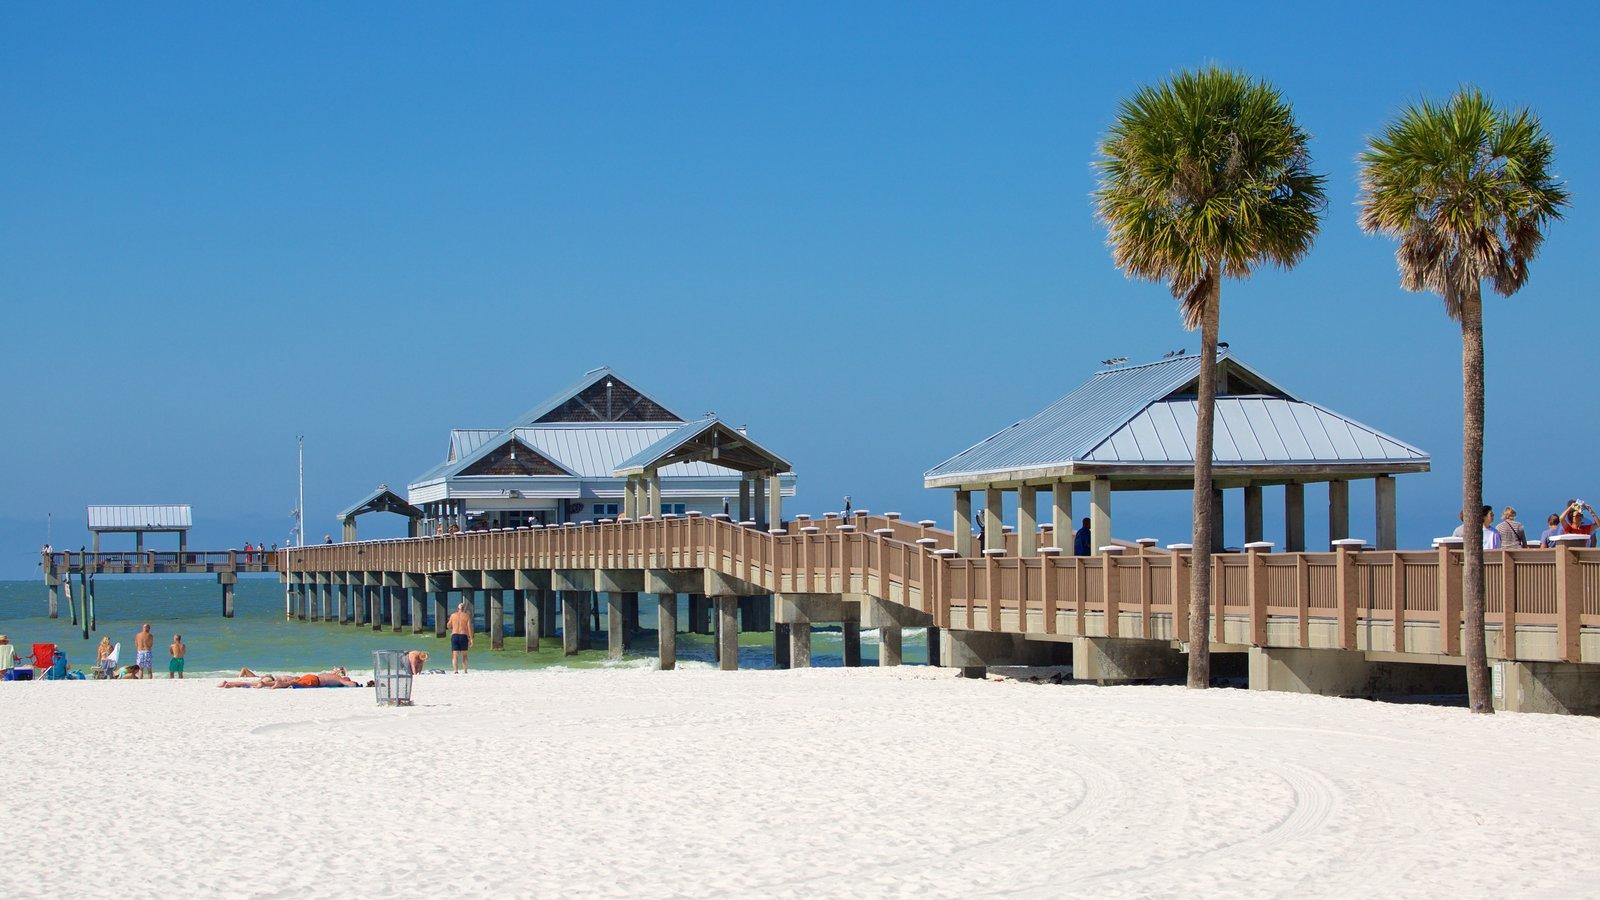 Clearwater Beach showing a sandy beach